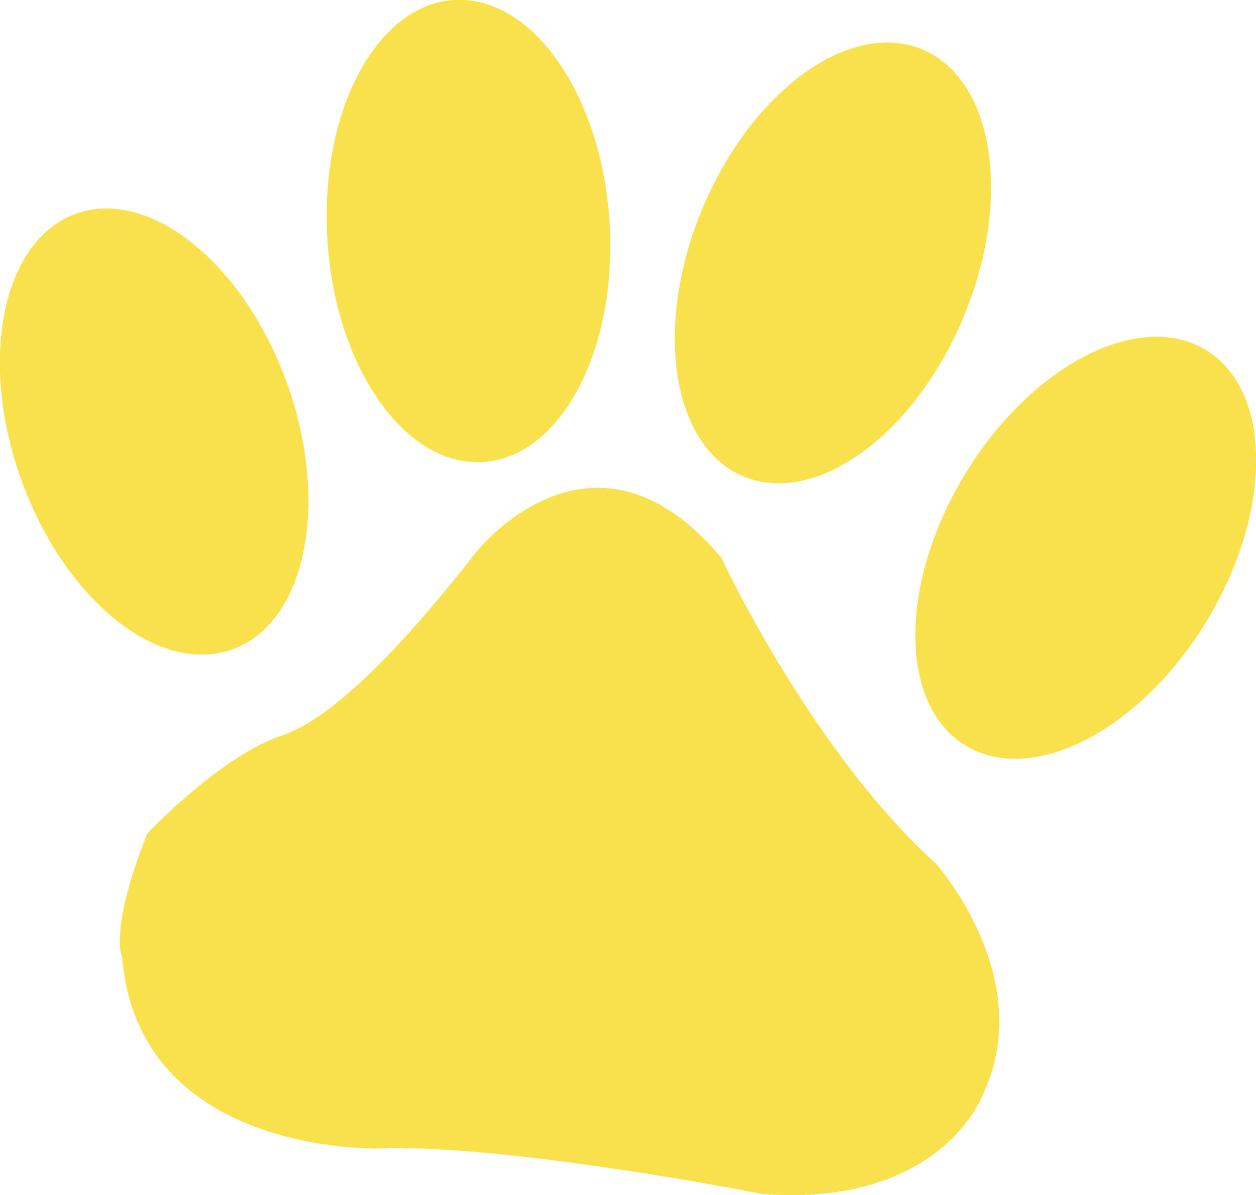 Dog Paw Print - ClipArt Best